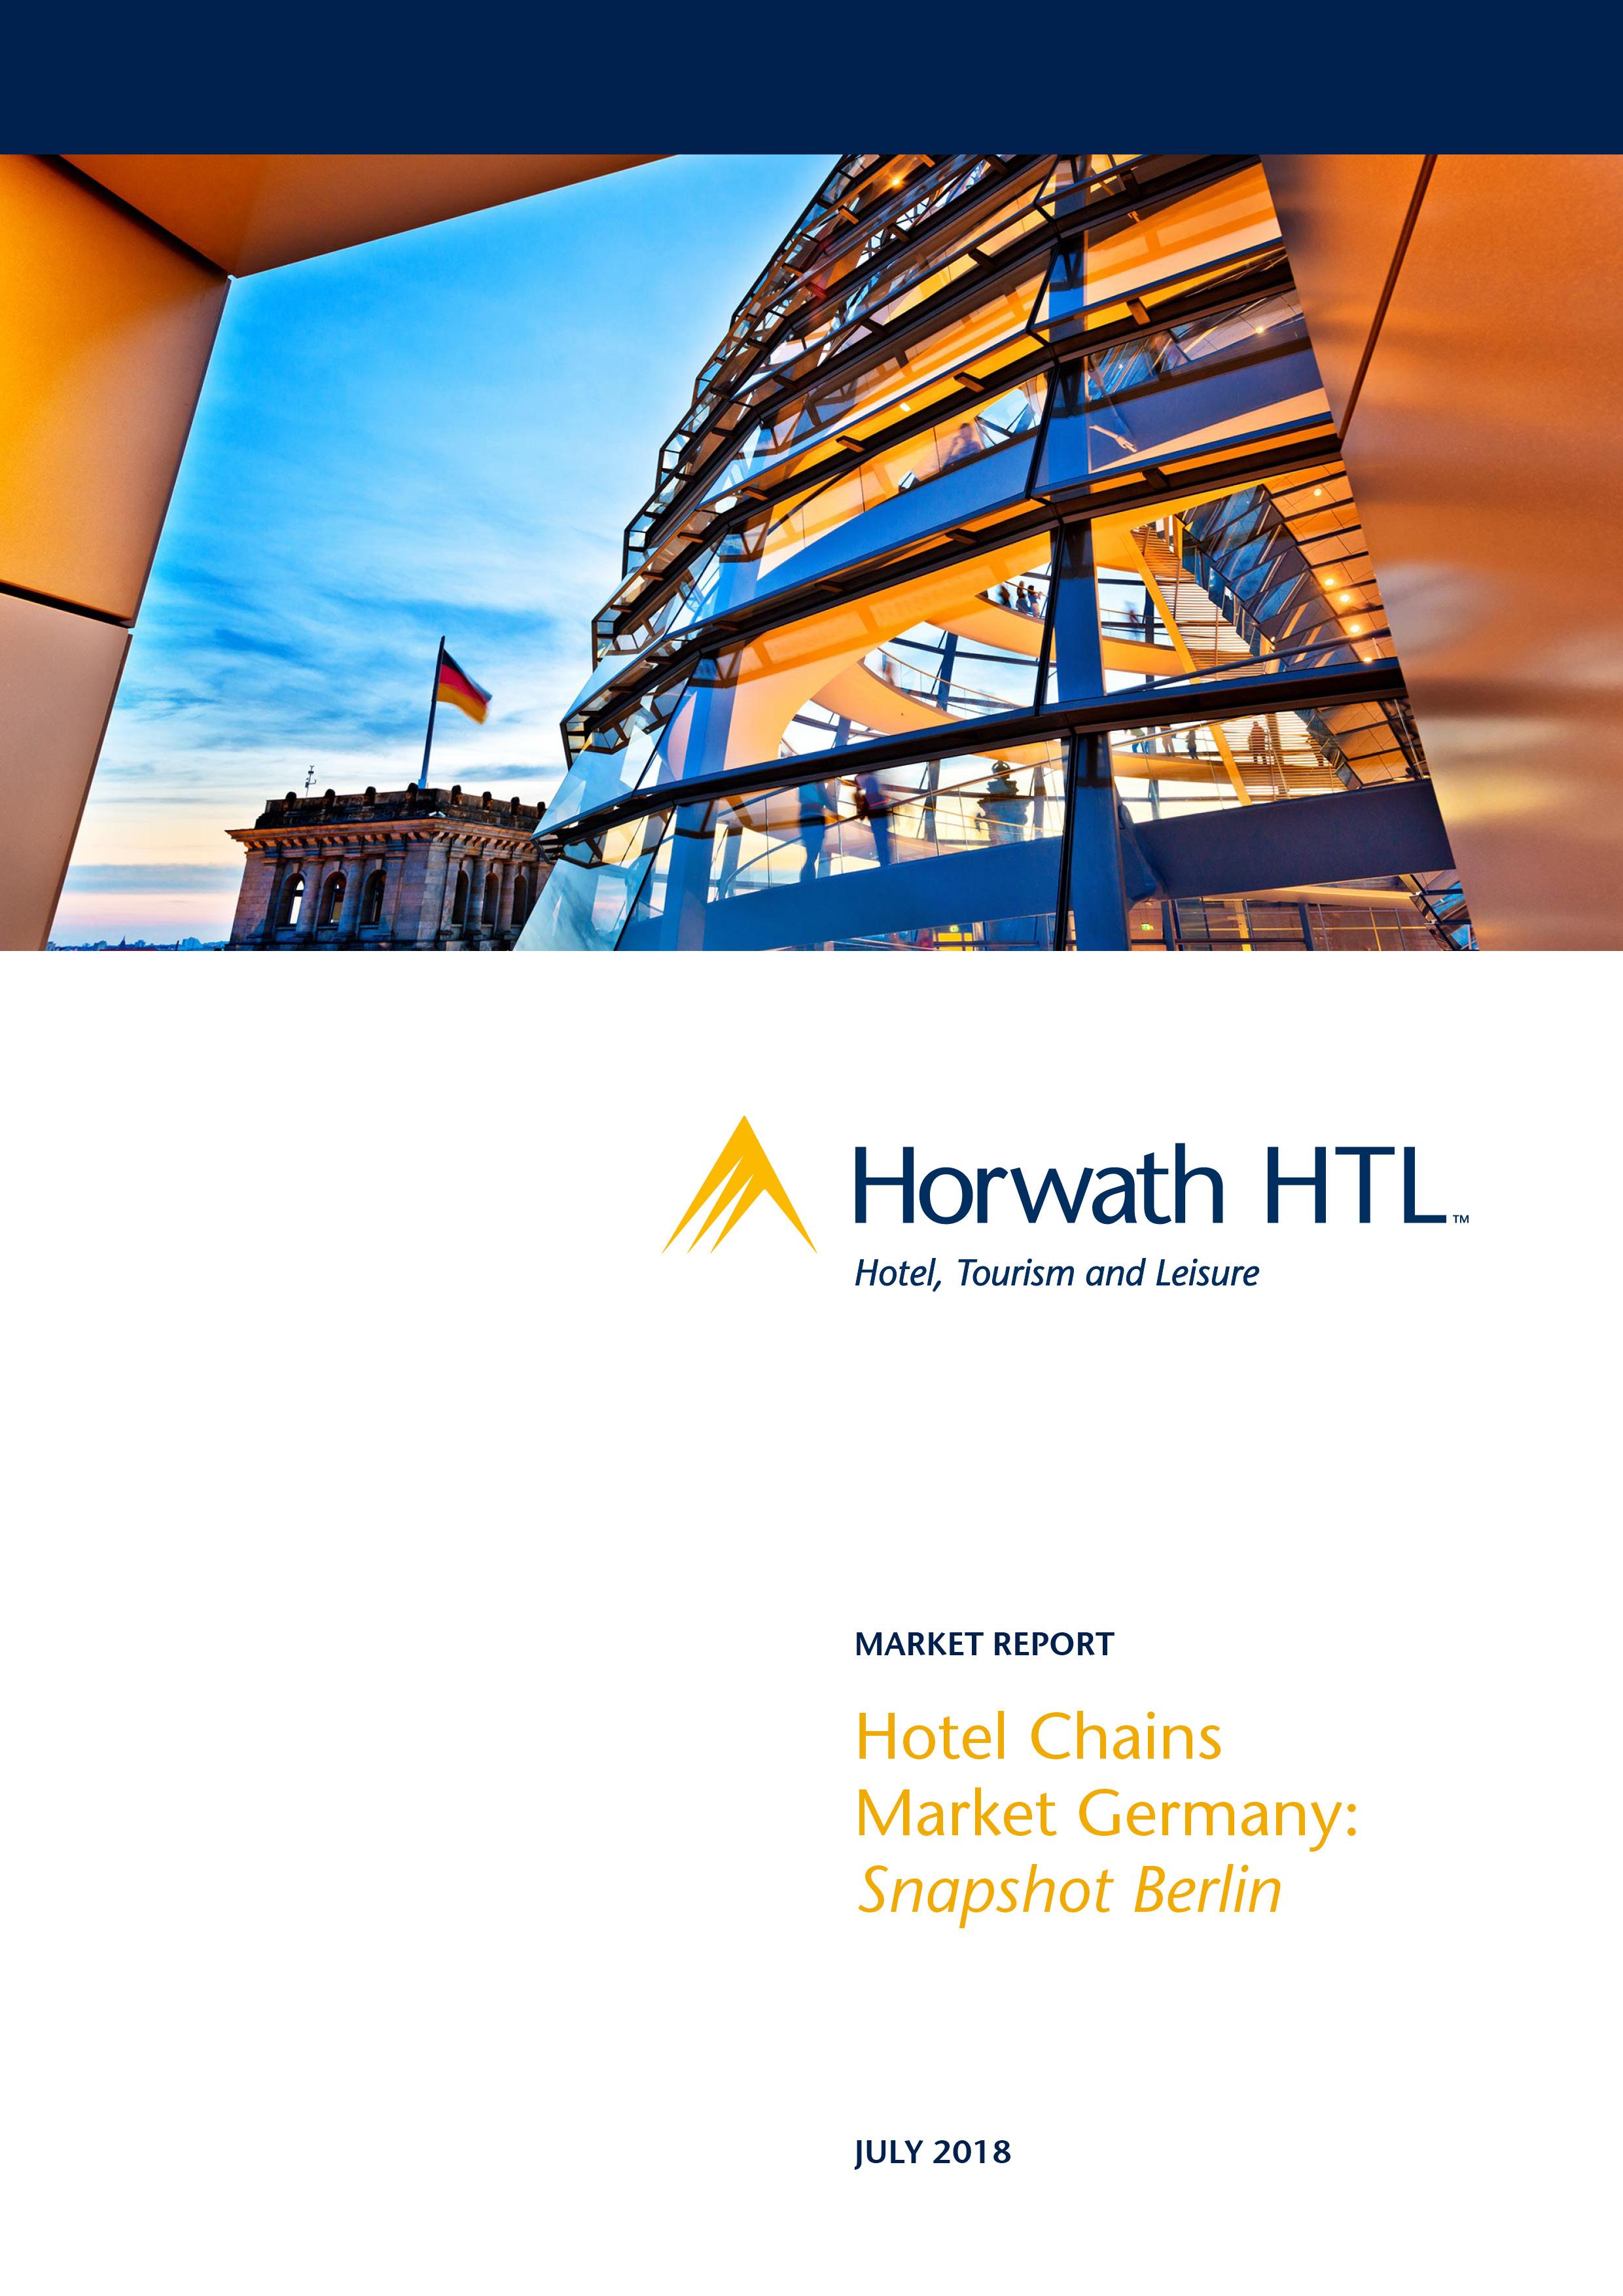 Market Report: Hotel Chains Market Germany; Snapshot Berlin